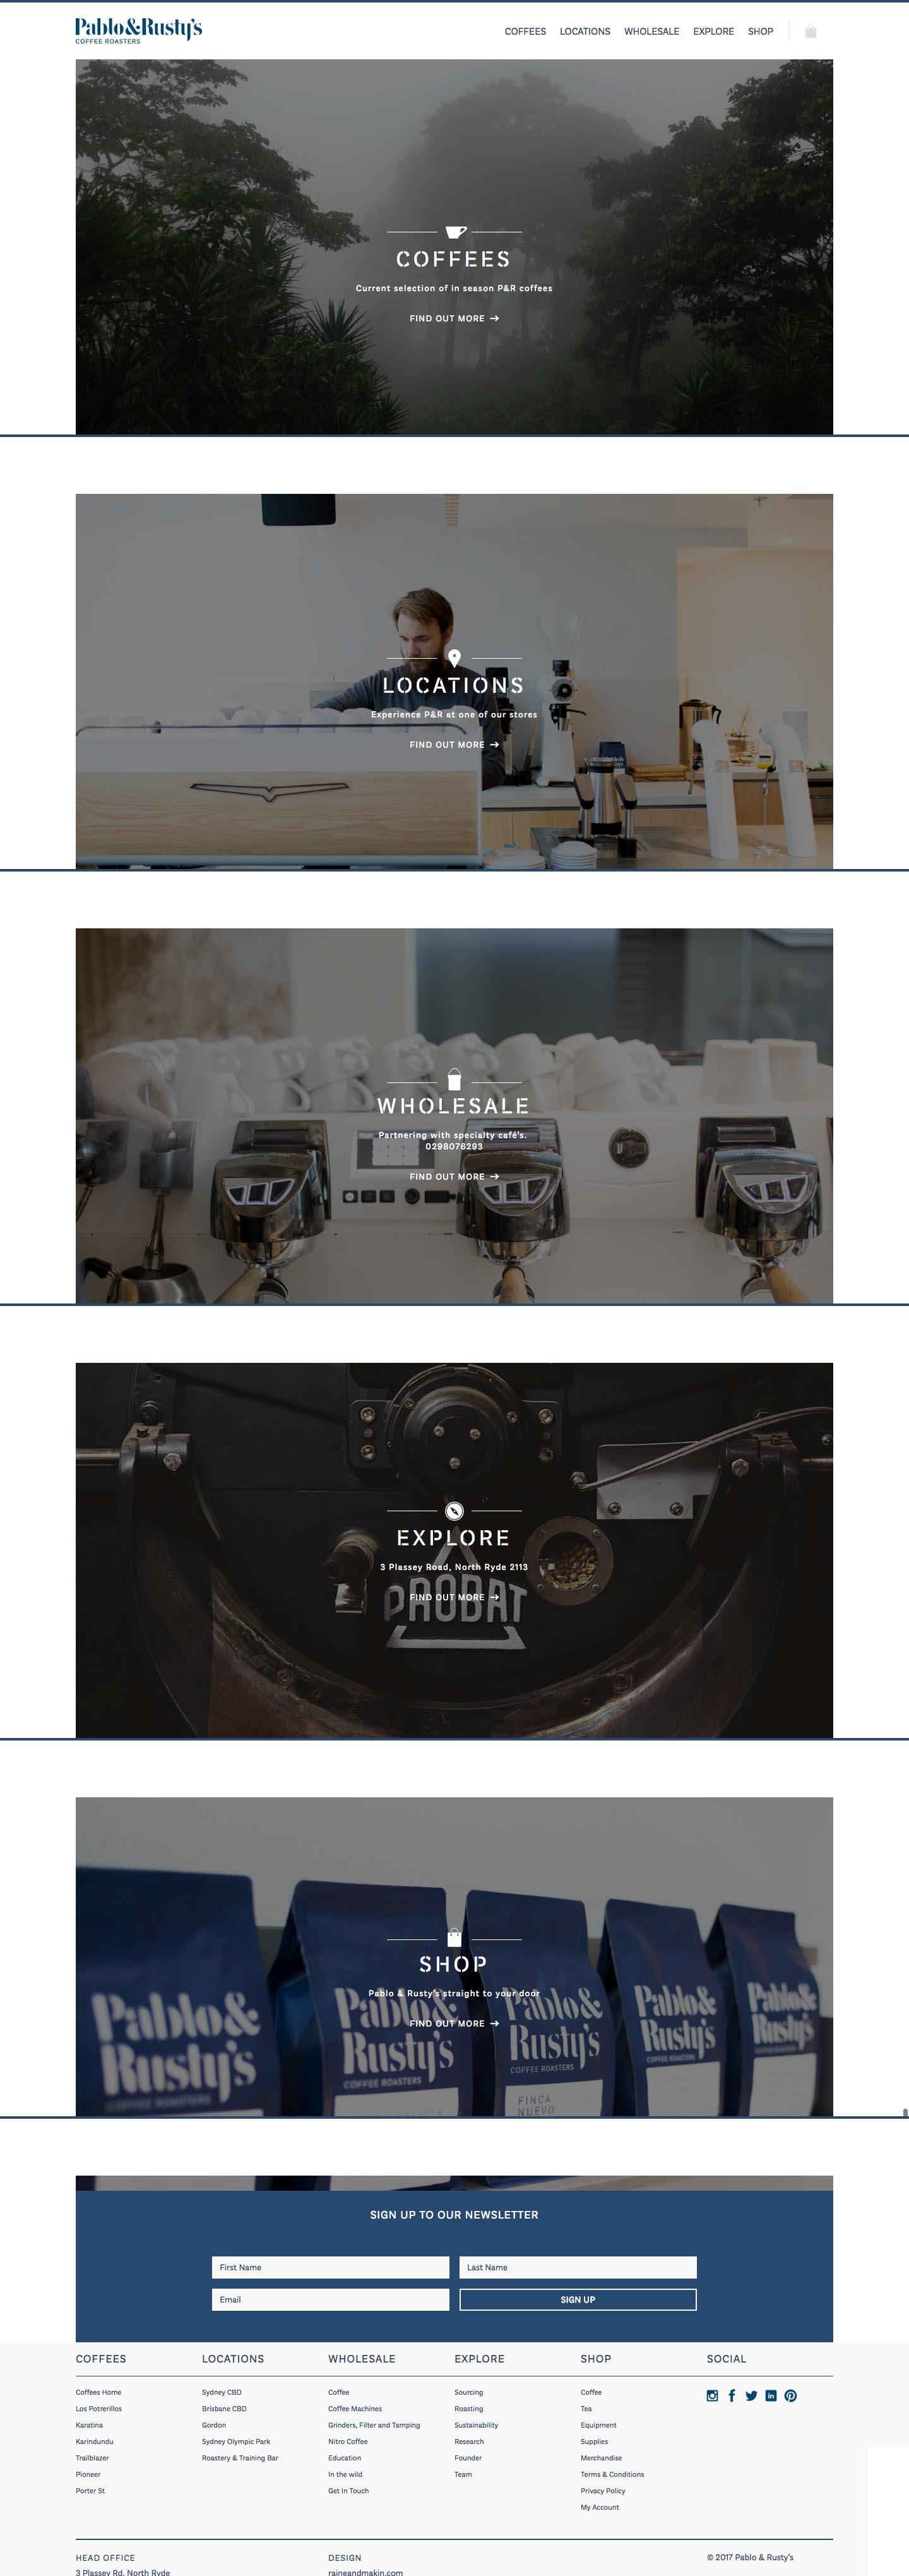 eCommerce website: Pablo & Rusty's